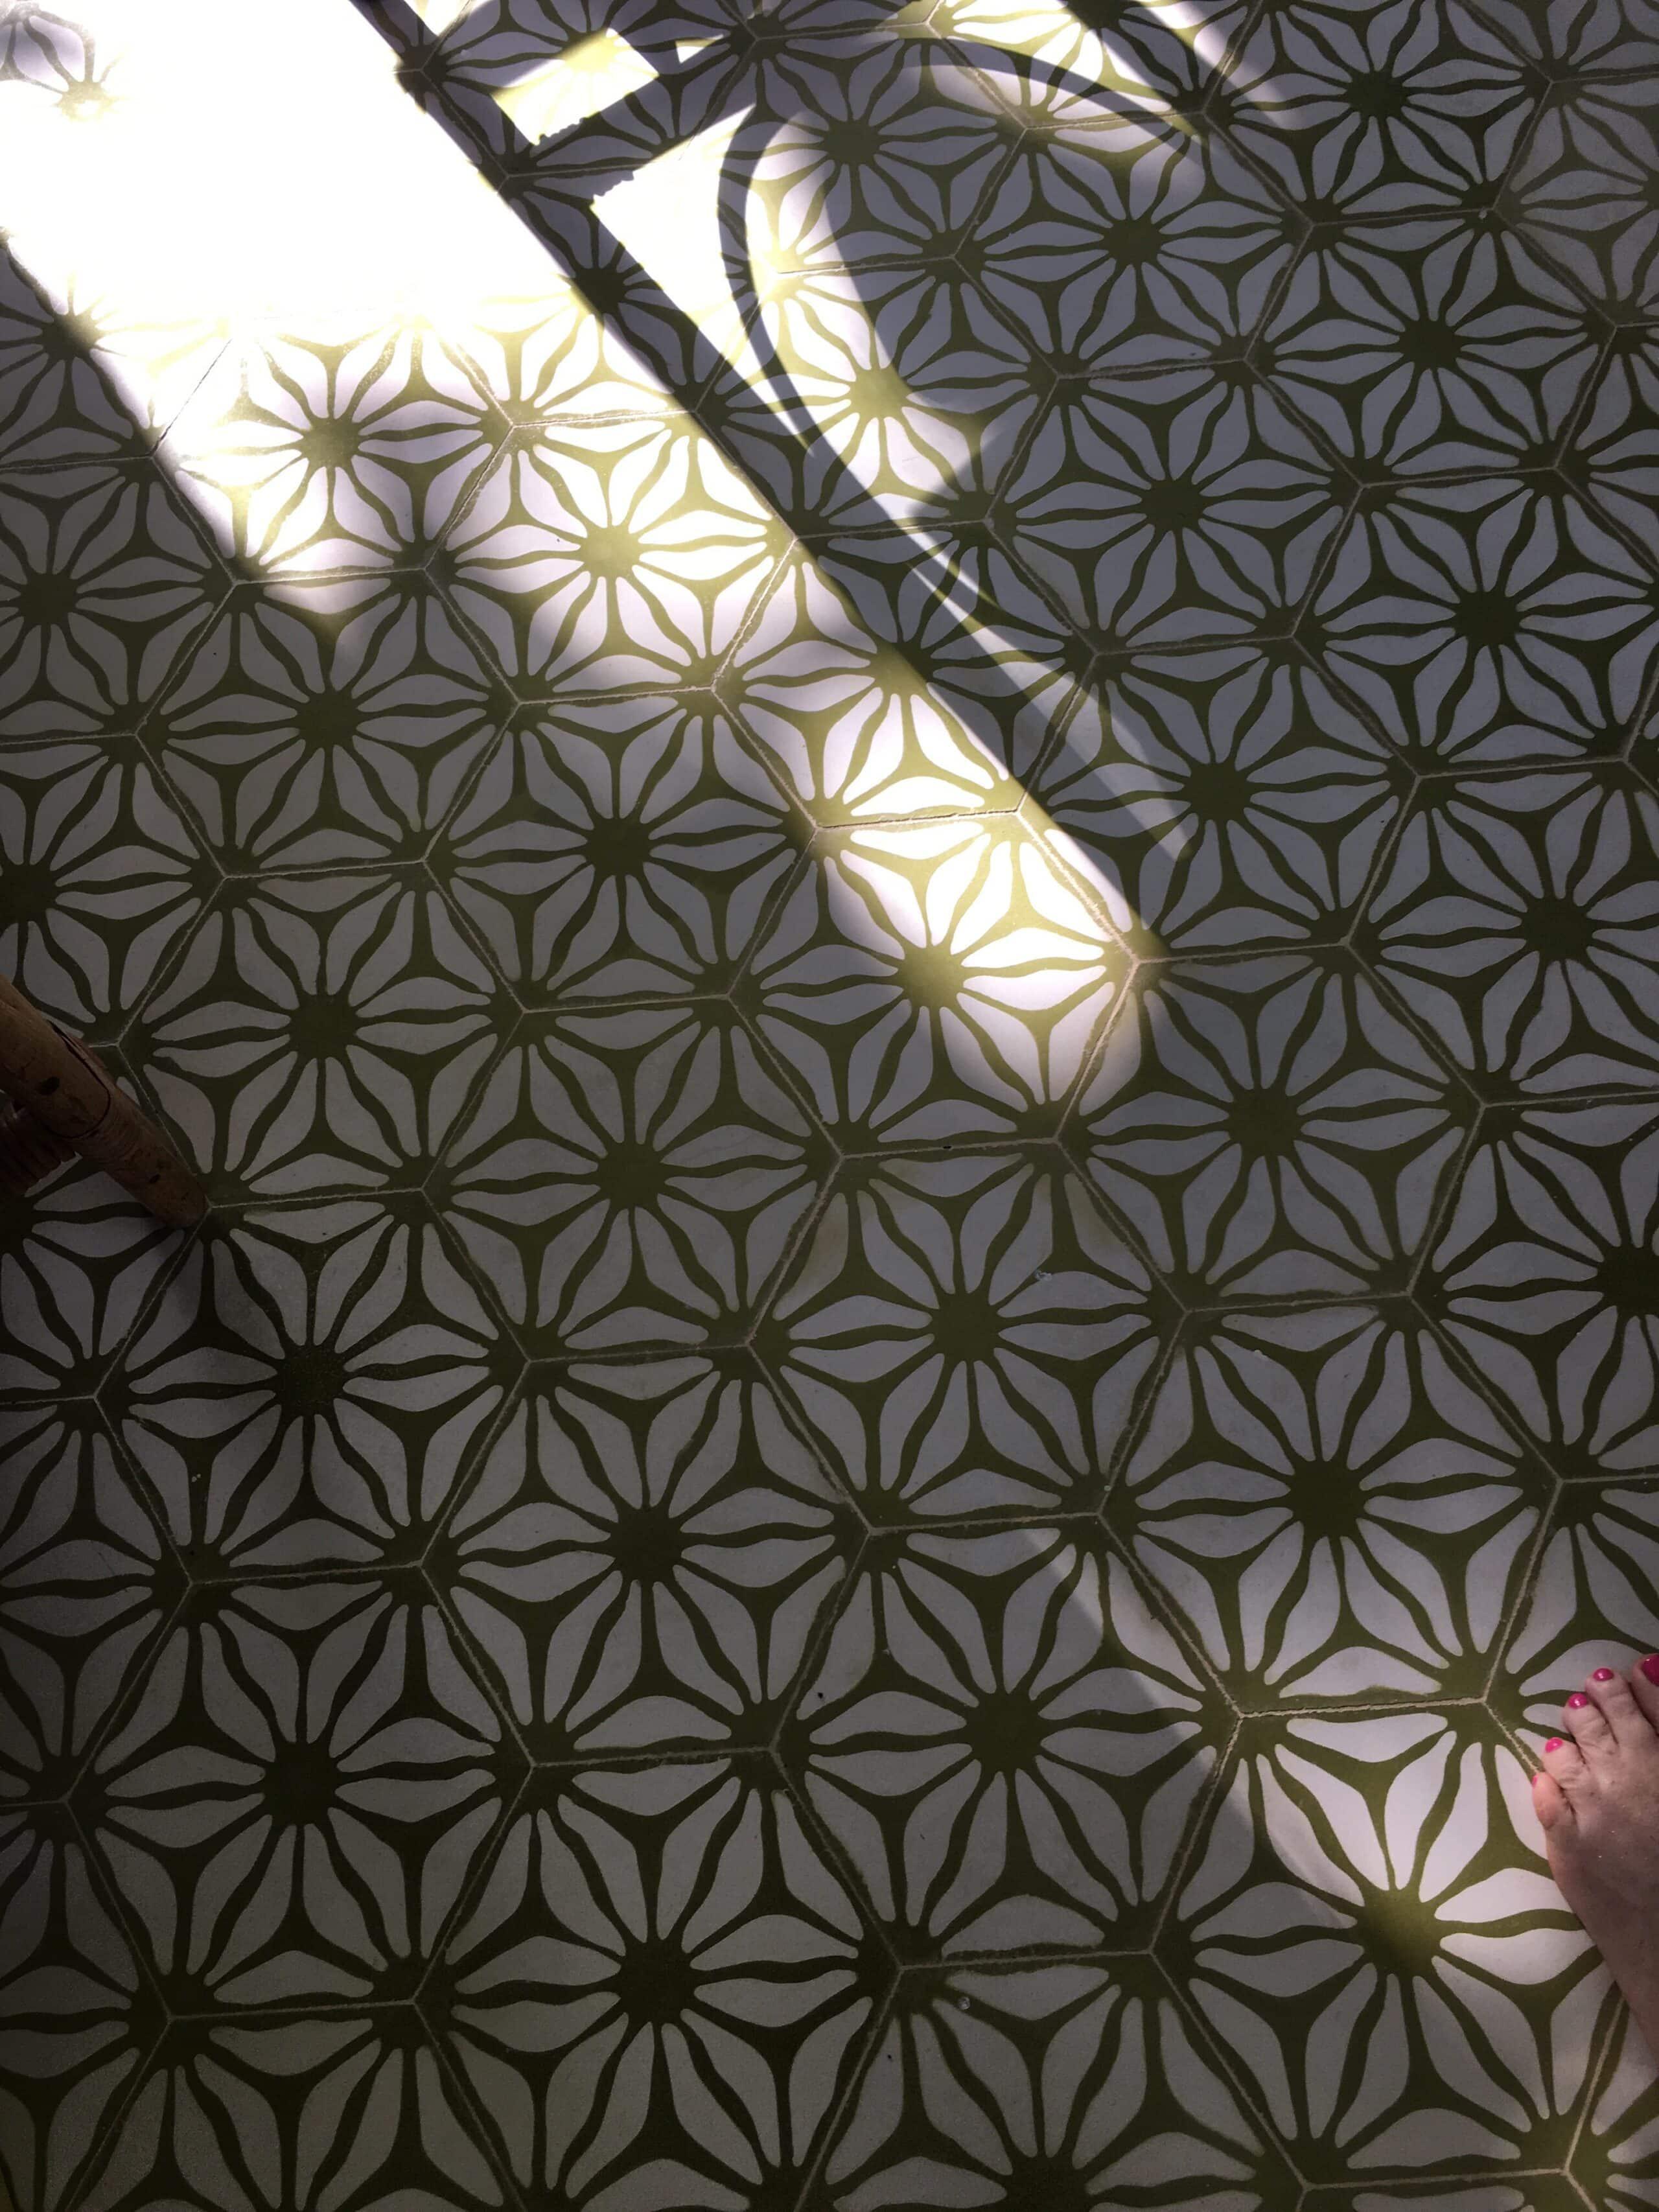 Playa Grande Beach Club cement tile